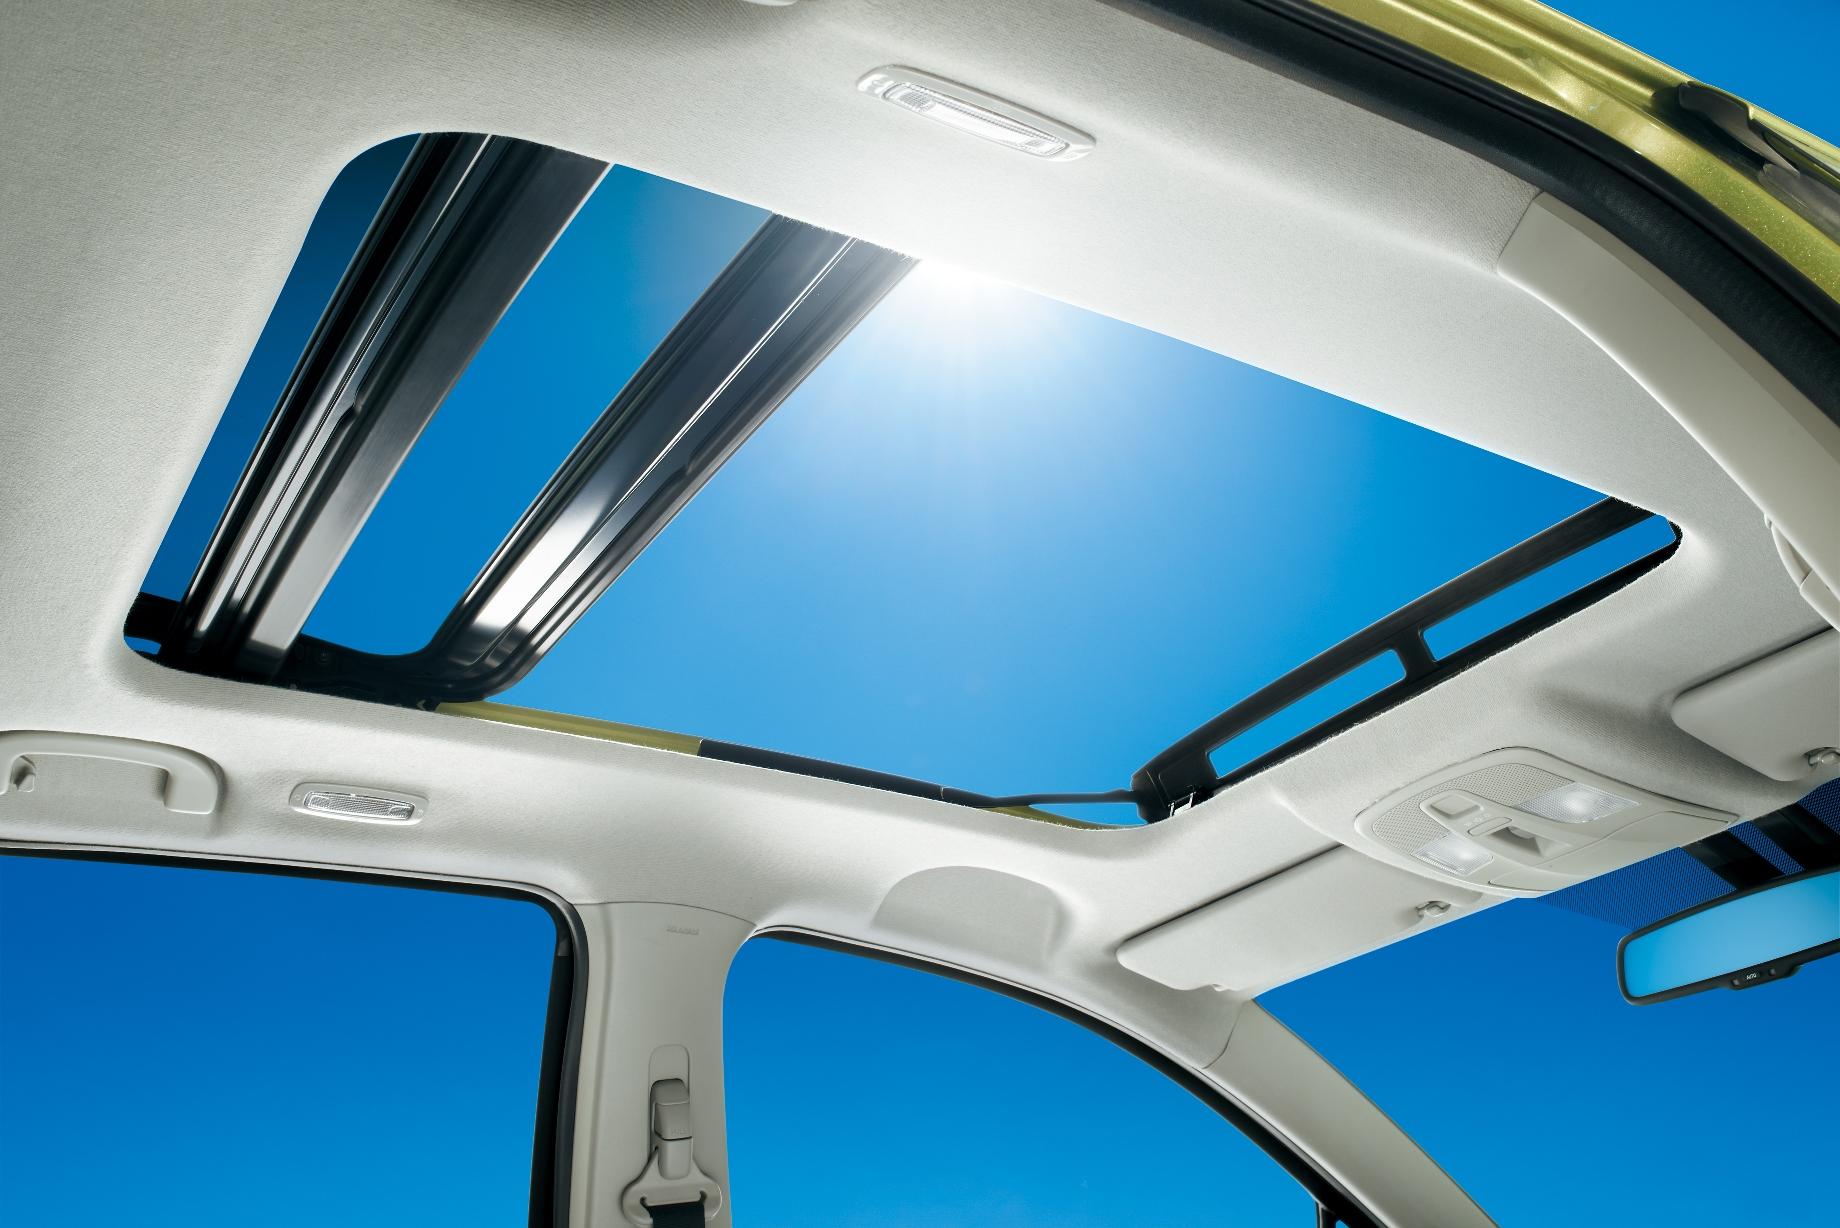 Suzuki Sx4 S Cross Tetto Panoramico 3 6